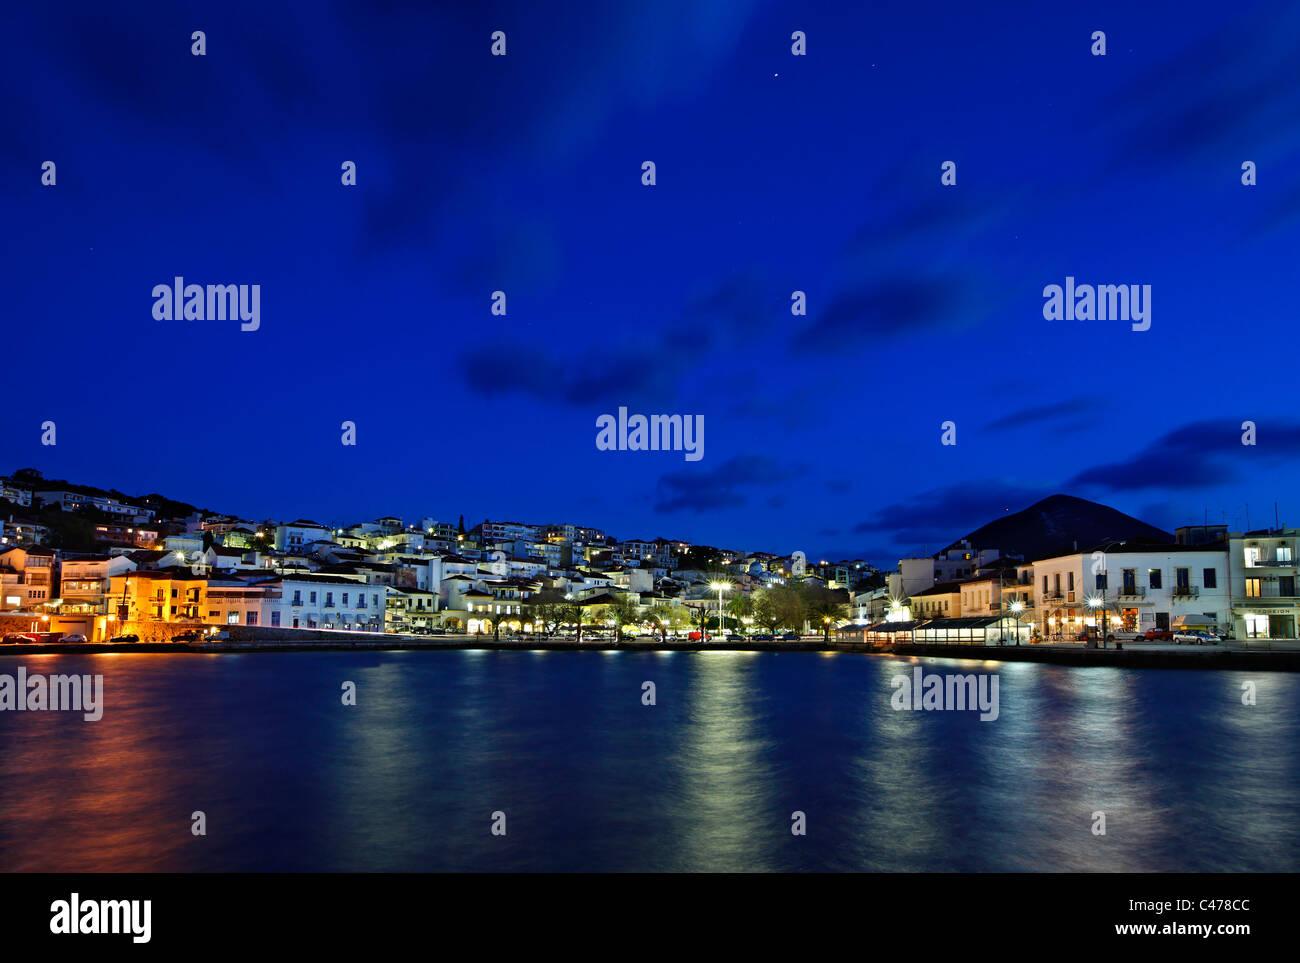 Night view of Pylos town (also known as 'Navarino'), Messinia prefecture, Peloponnese, Greece - Stock Image